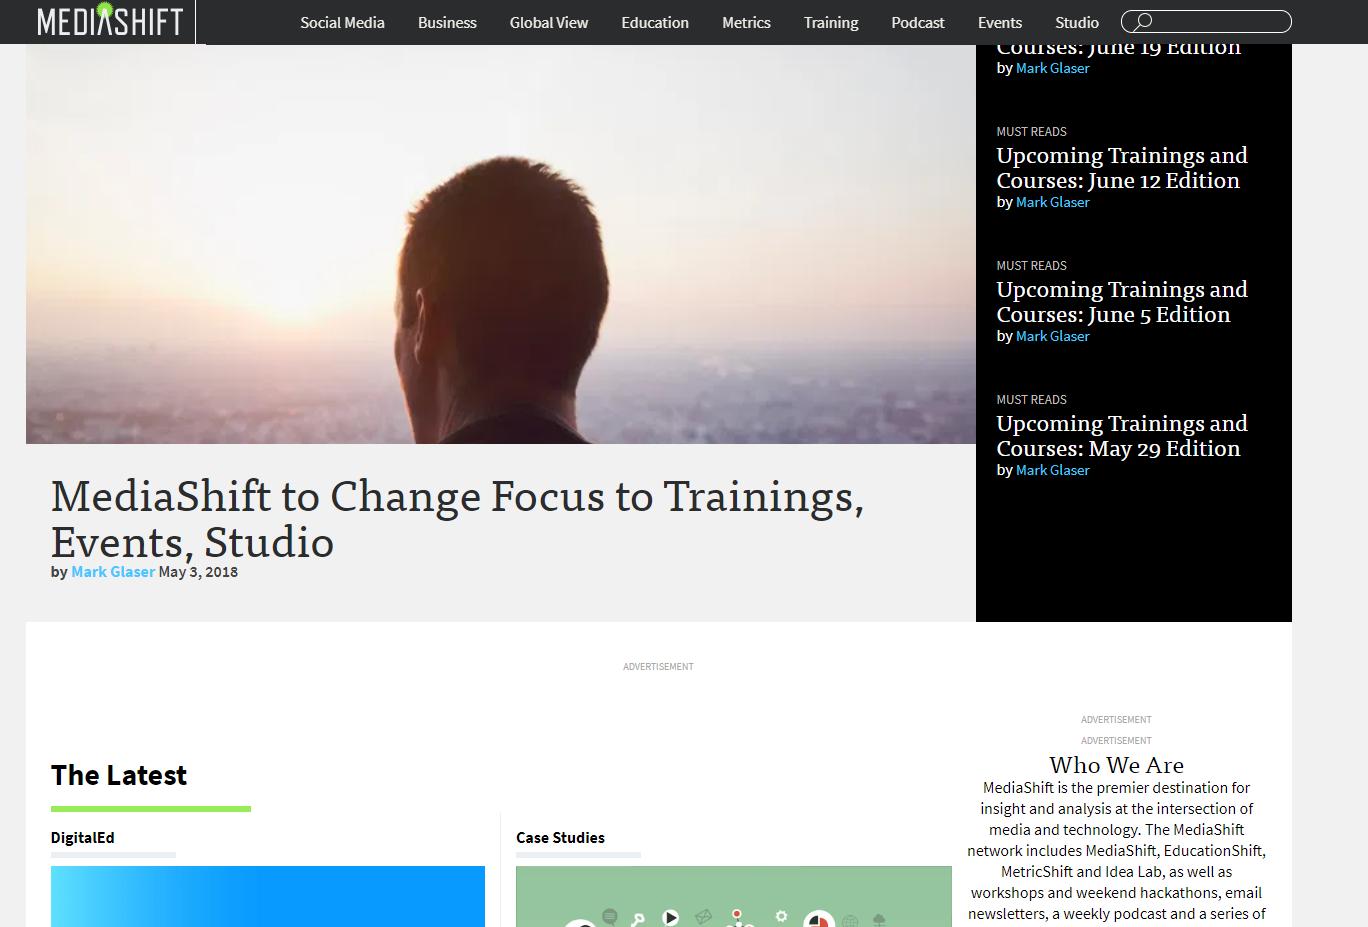 MediaShift Home Page